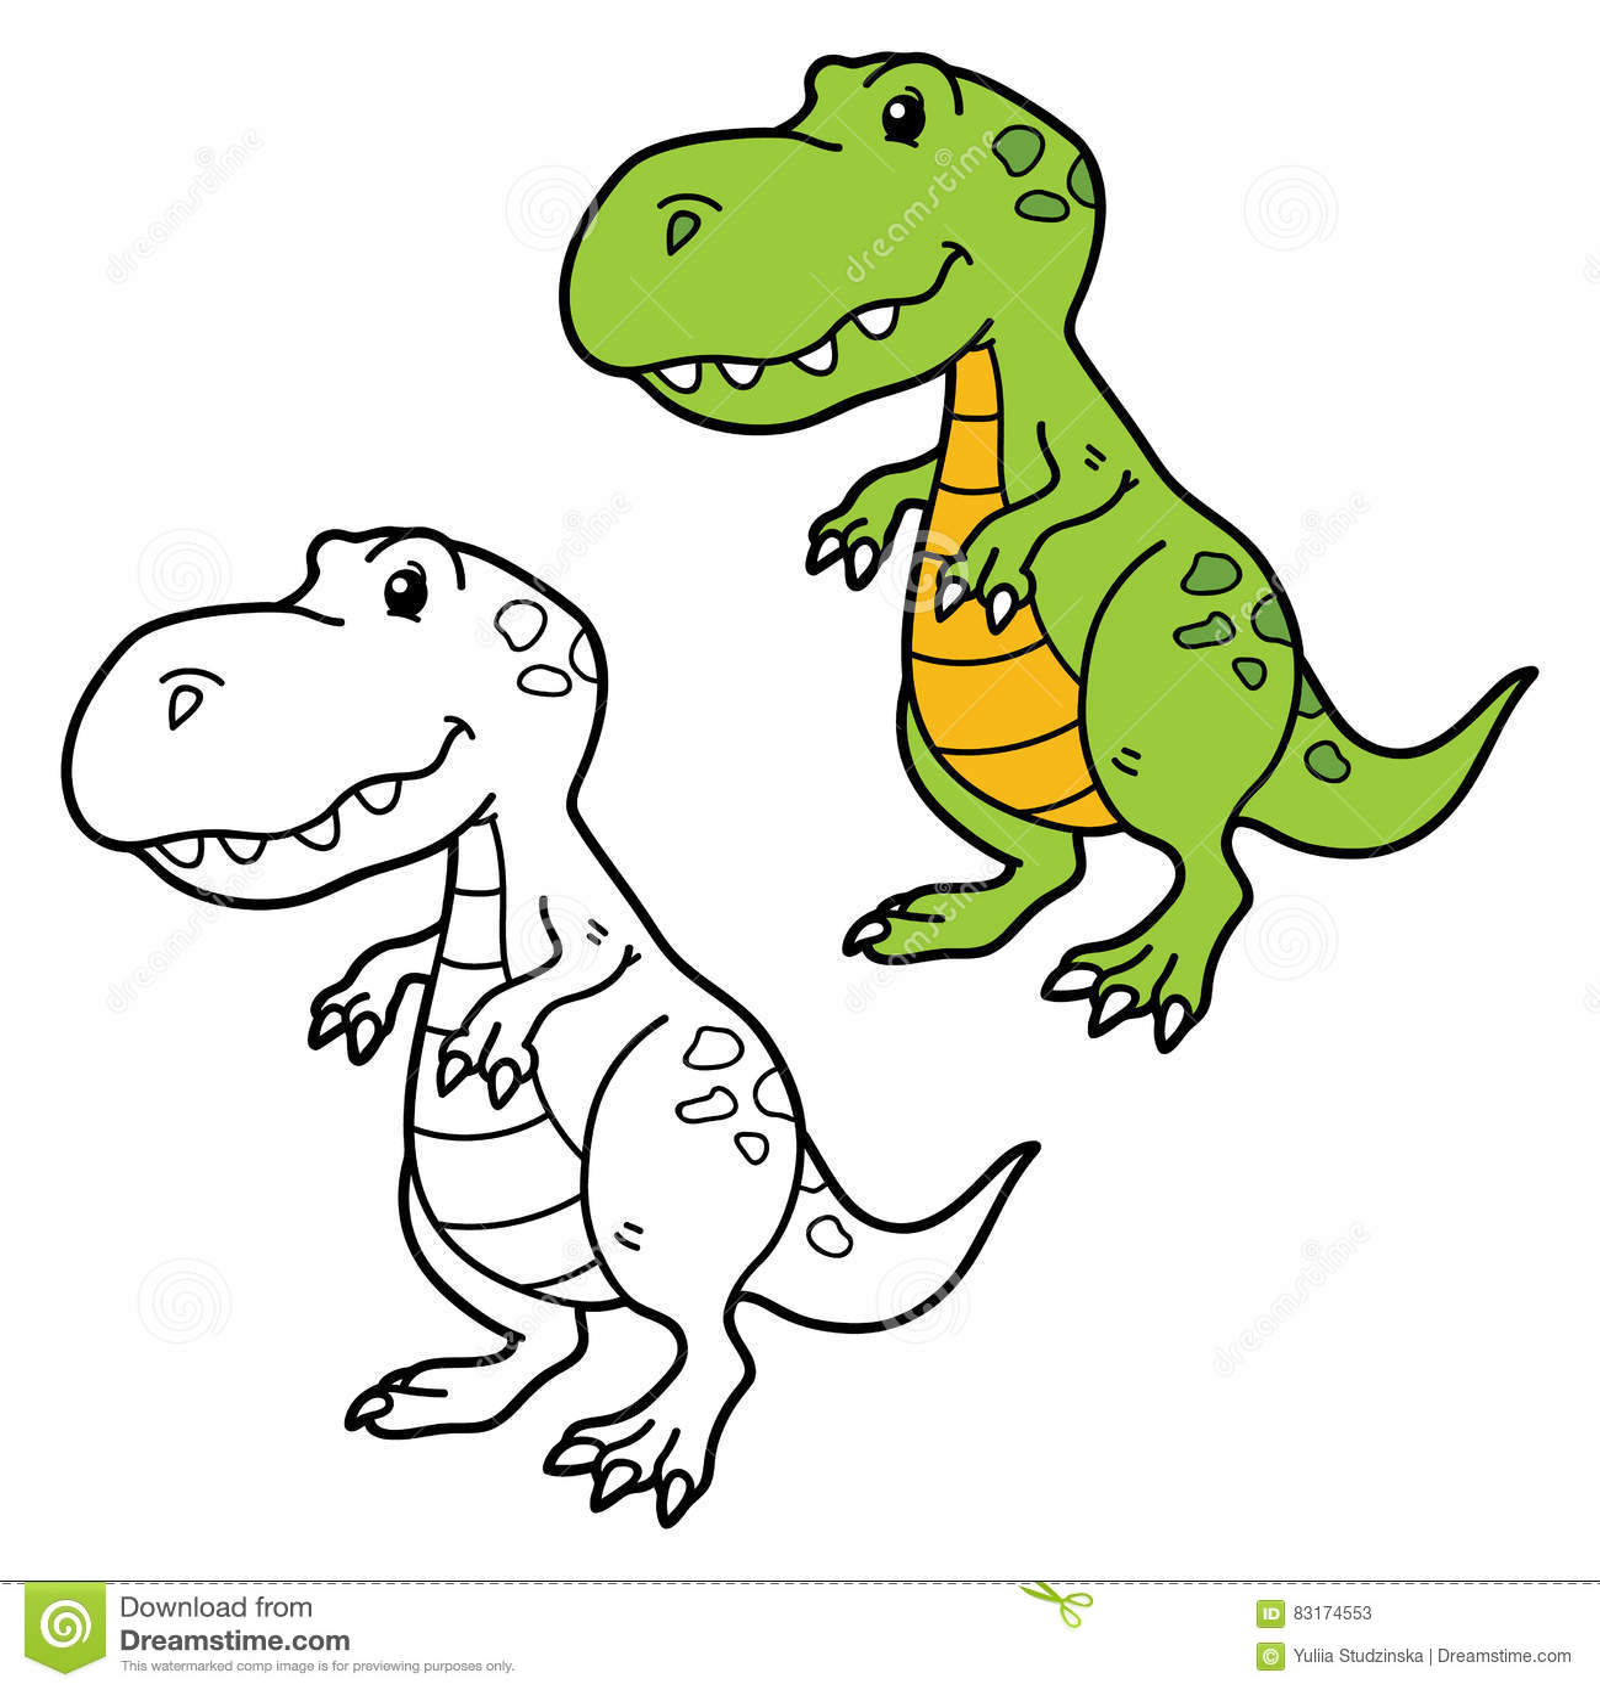 Cute Cartoon Dino Stock Vector Illustration Of Outline 83174553